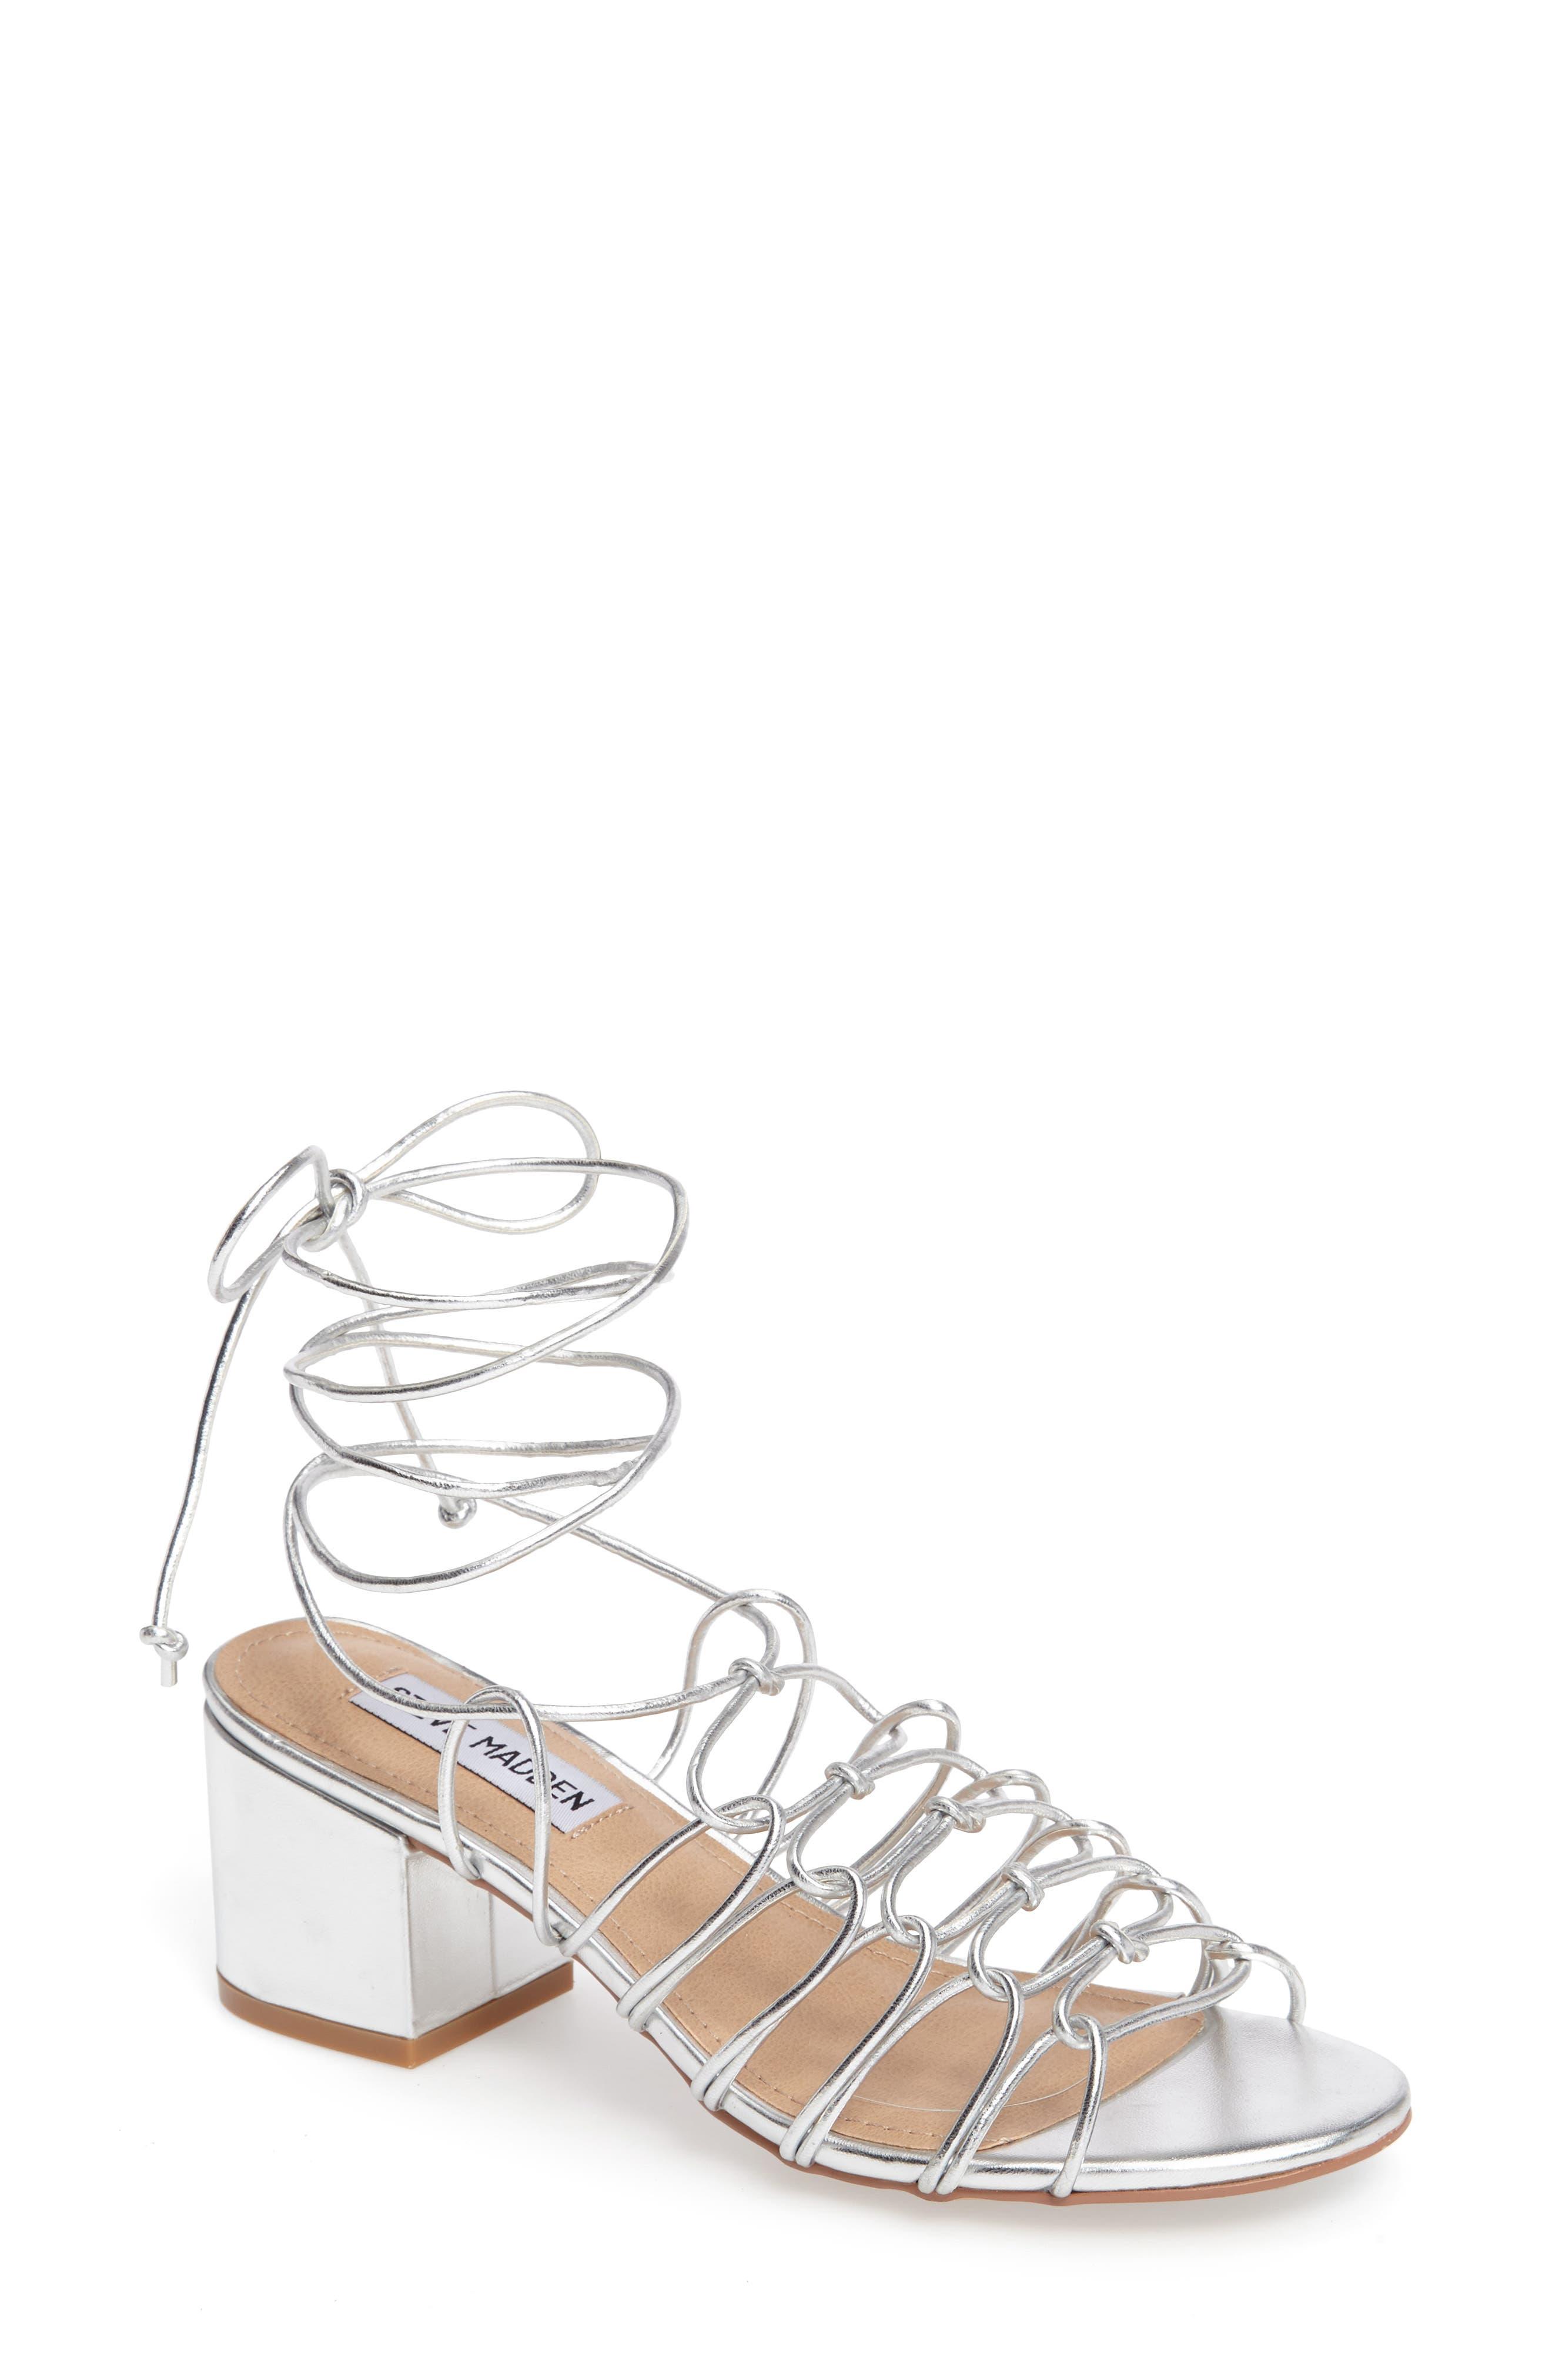 Alternate Image 1 Selected - Steve Madden Illie Knotted Lace Sandal (Women)